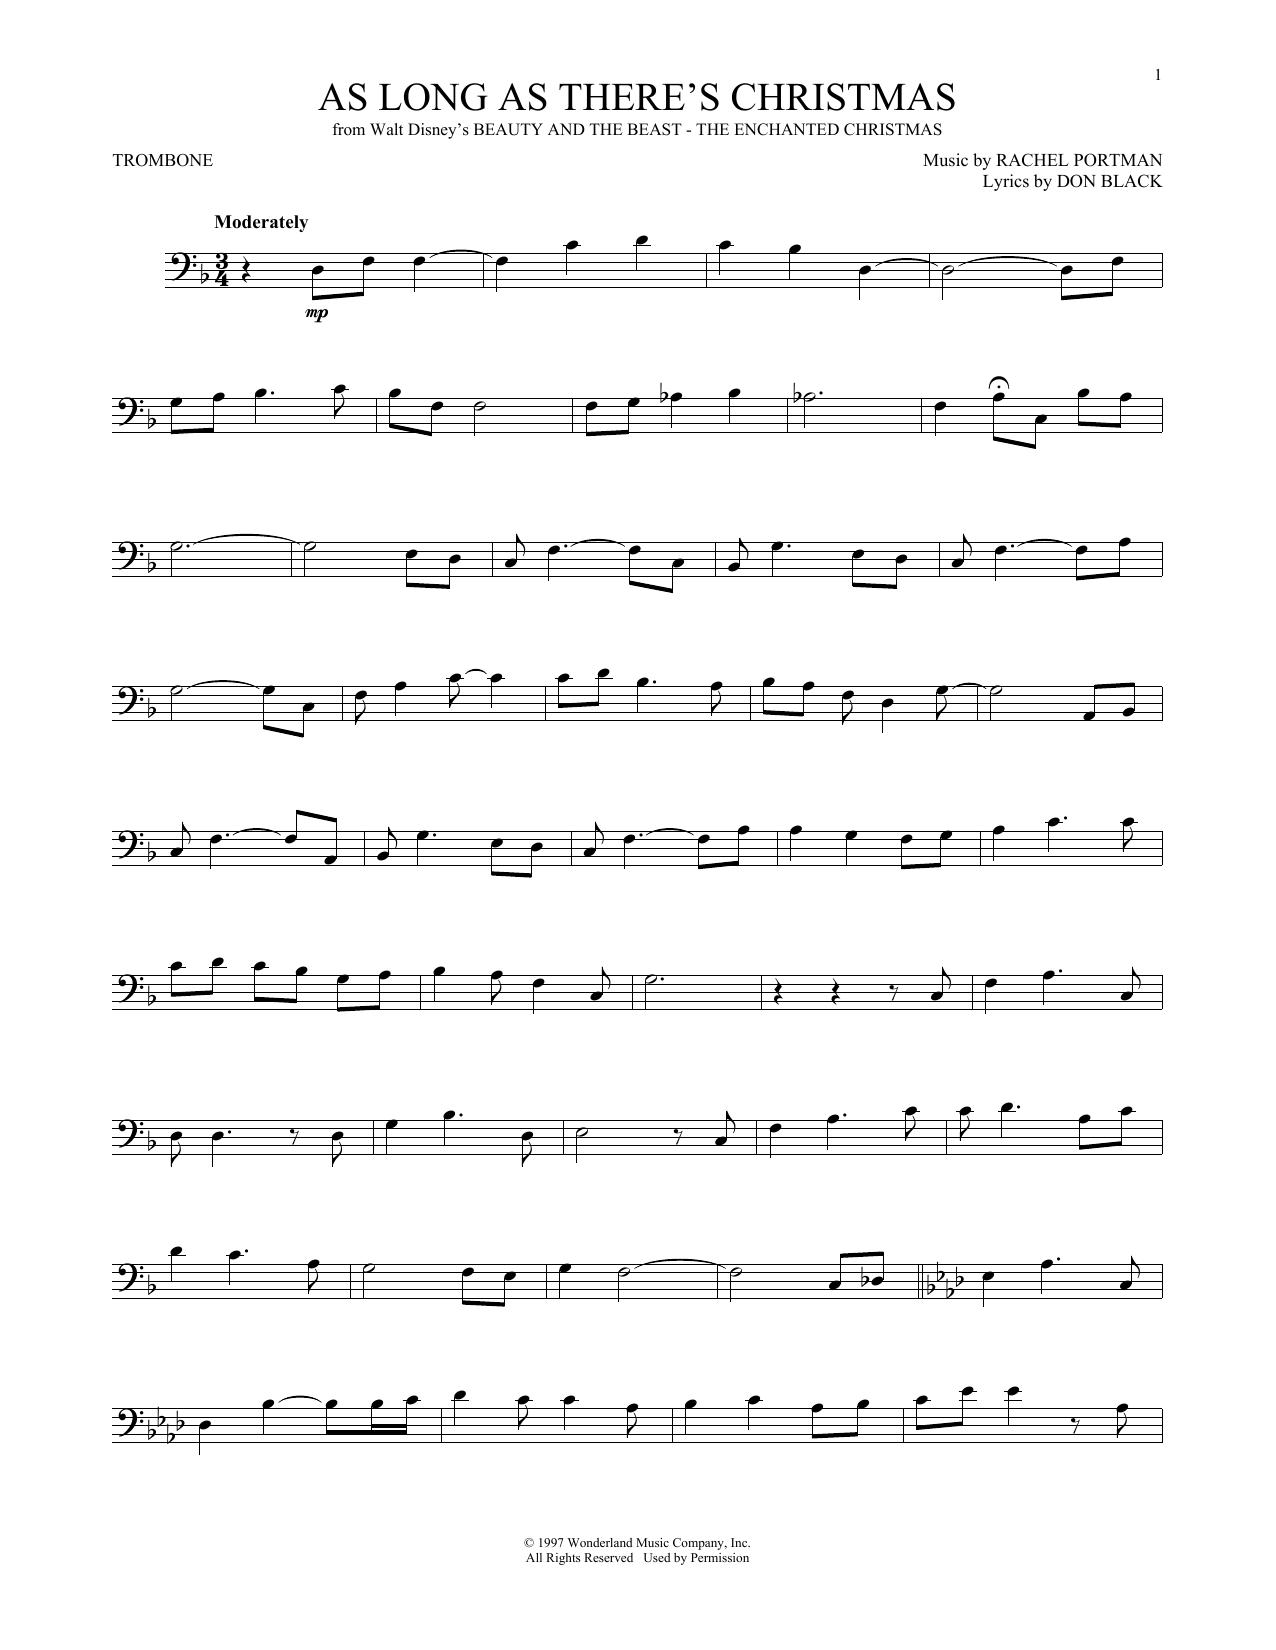 Christmas Music - Trombone at Stanton\'s Sheet Music